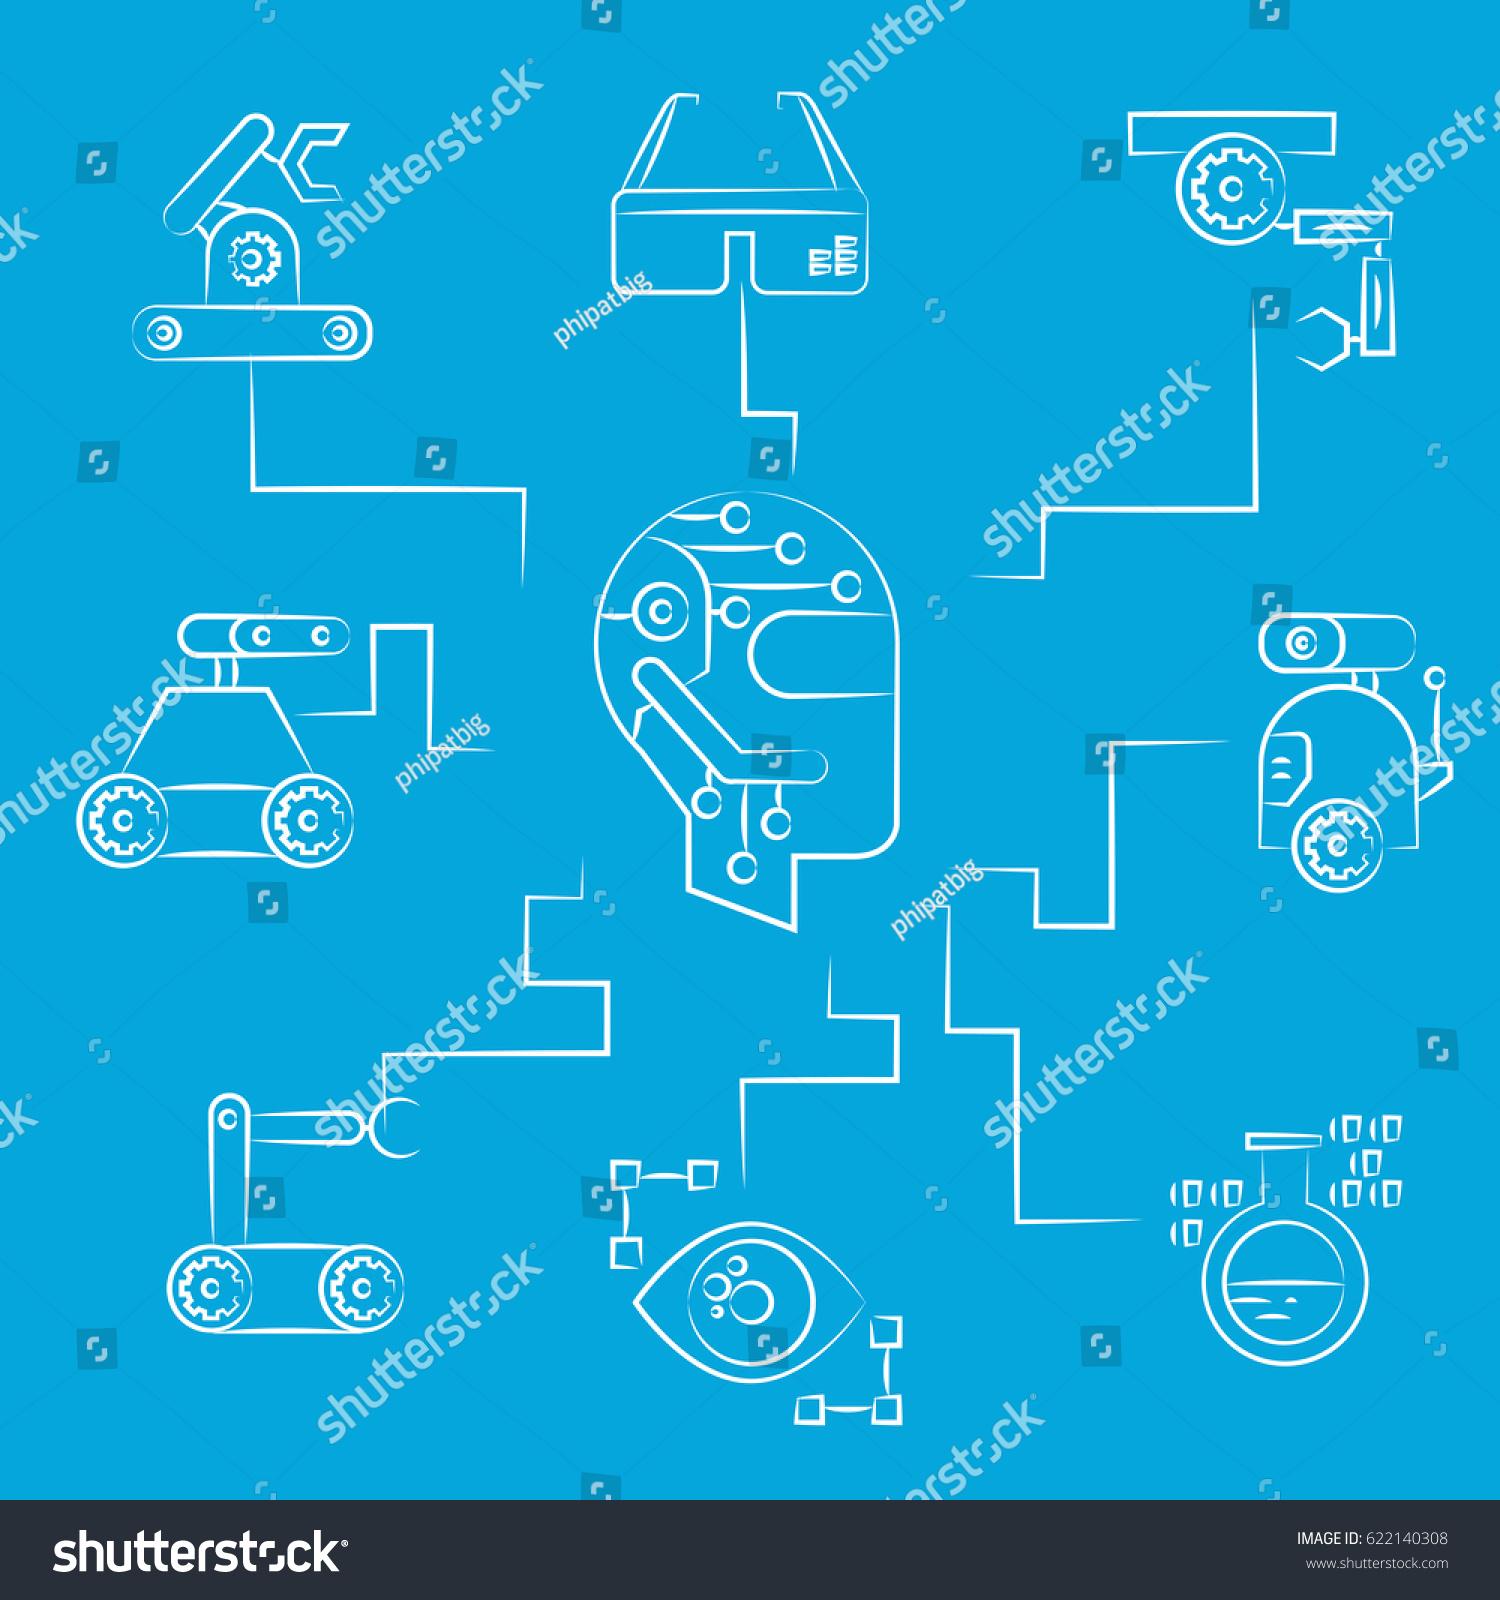 Robotics Concept Diagram Blue Background Stock Vector Royalty Free